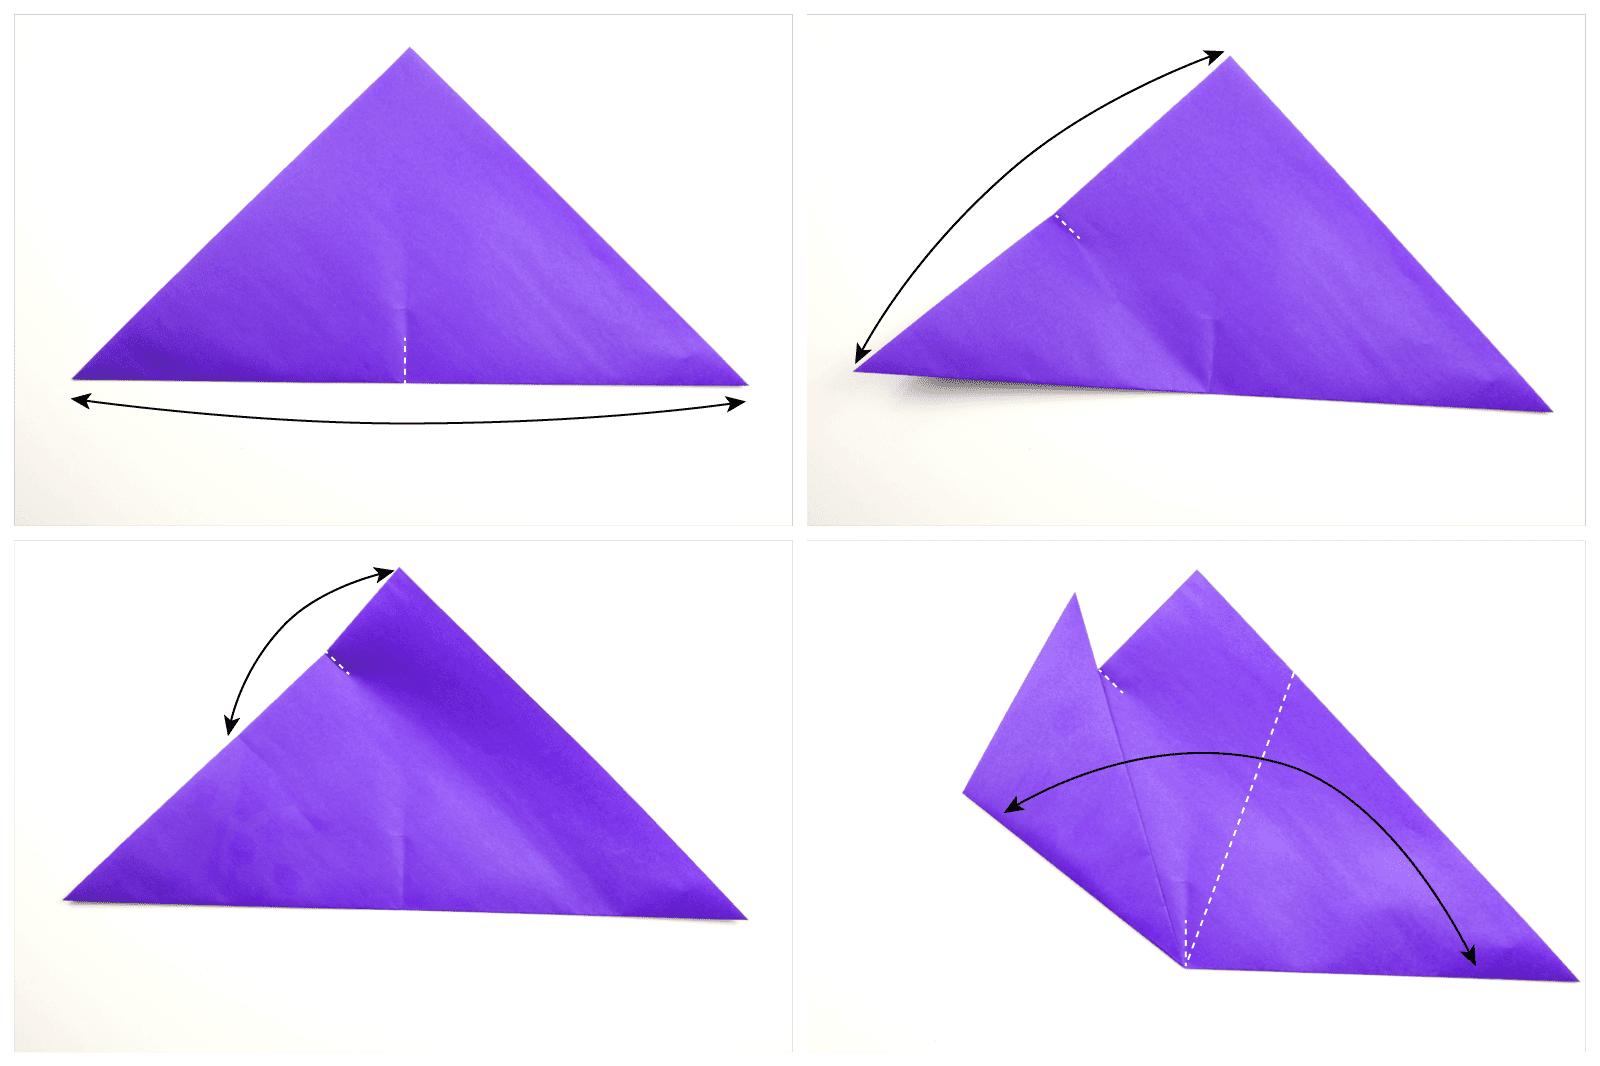 Folding paper into pentagon